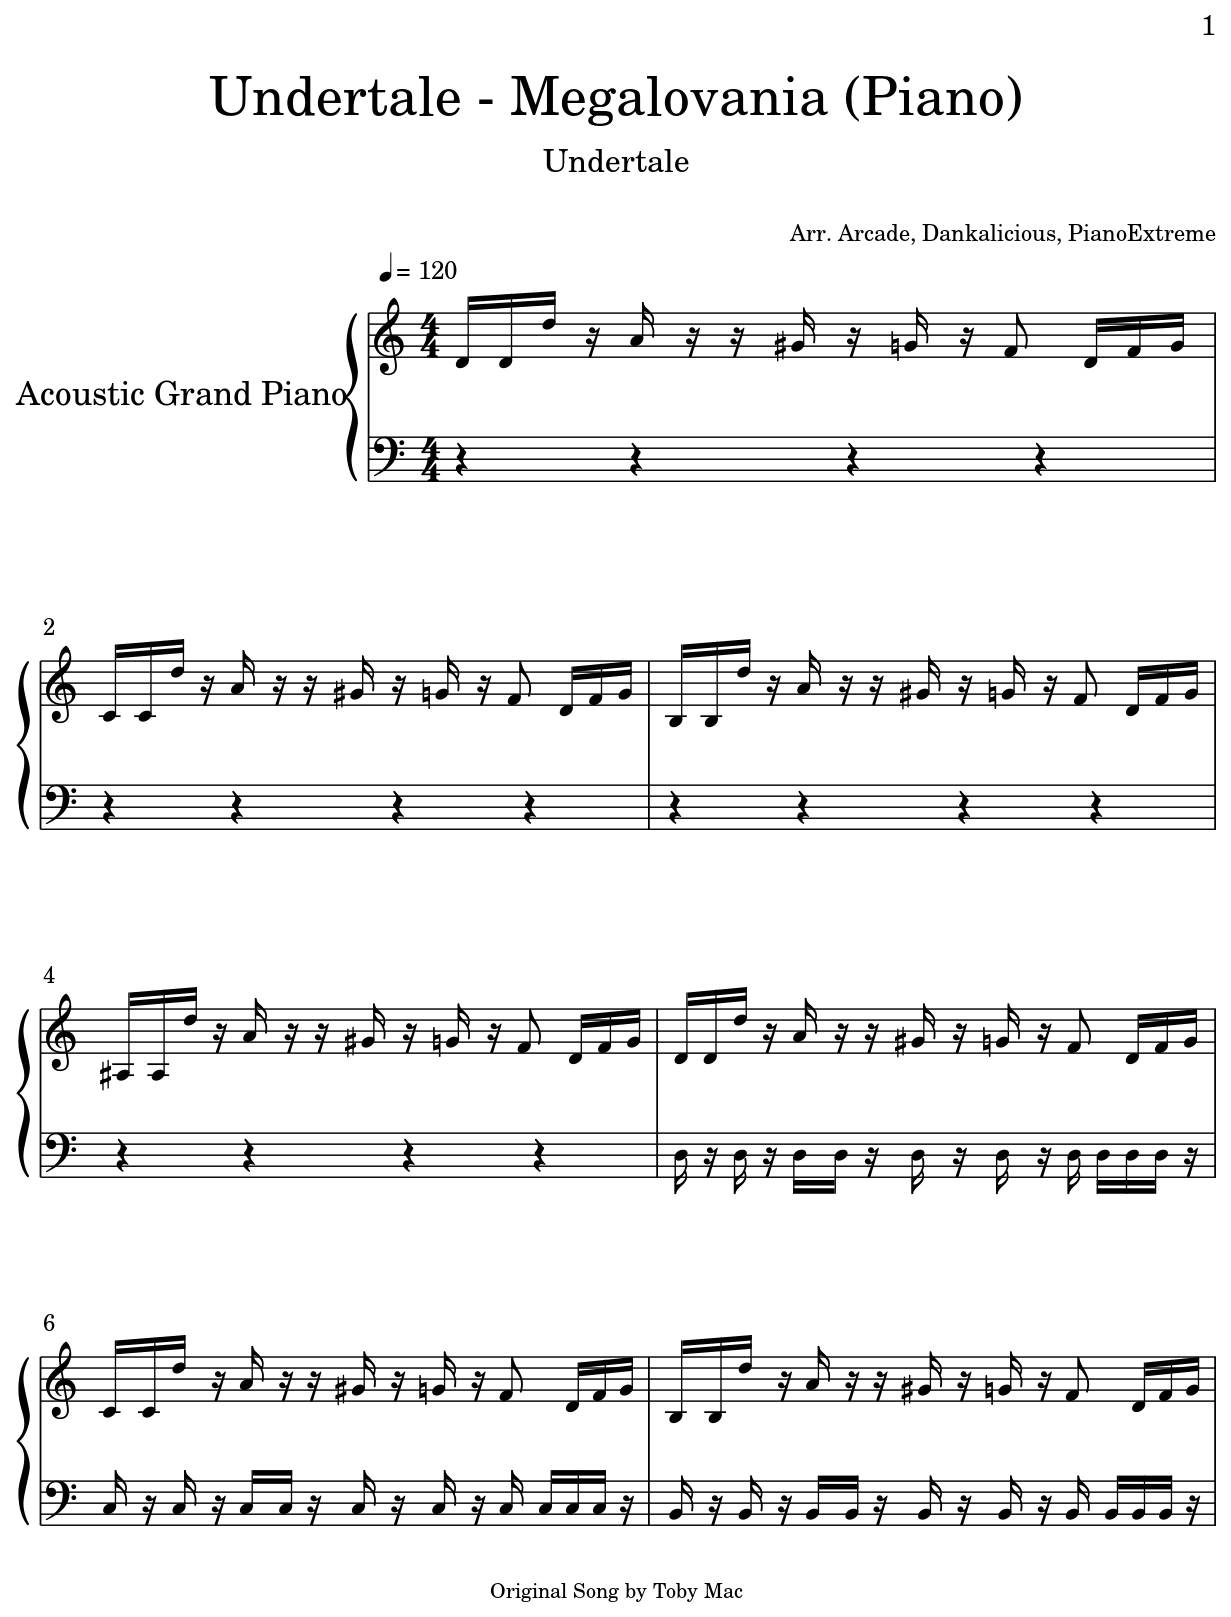 Undertale - Megalovania (Piano) - Flat